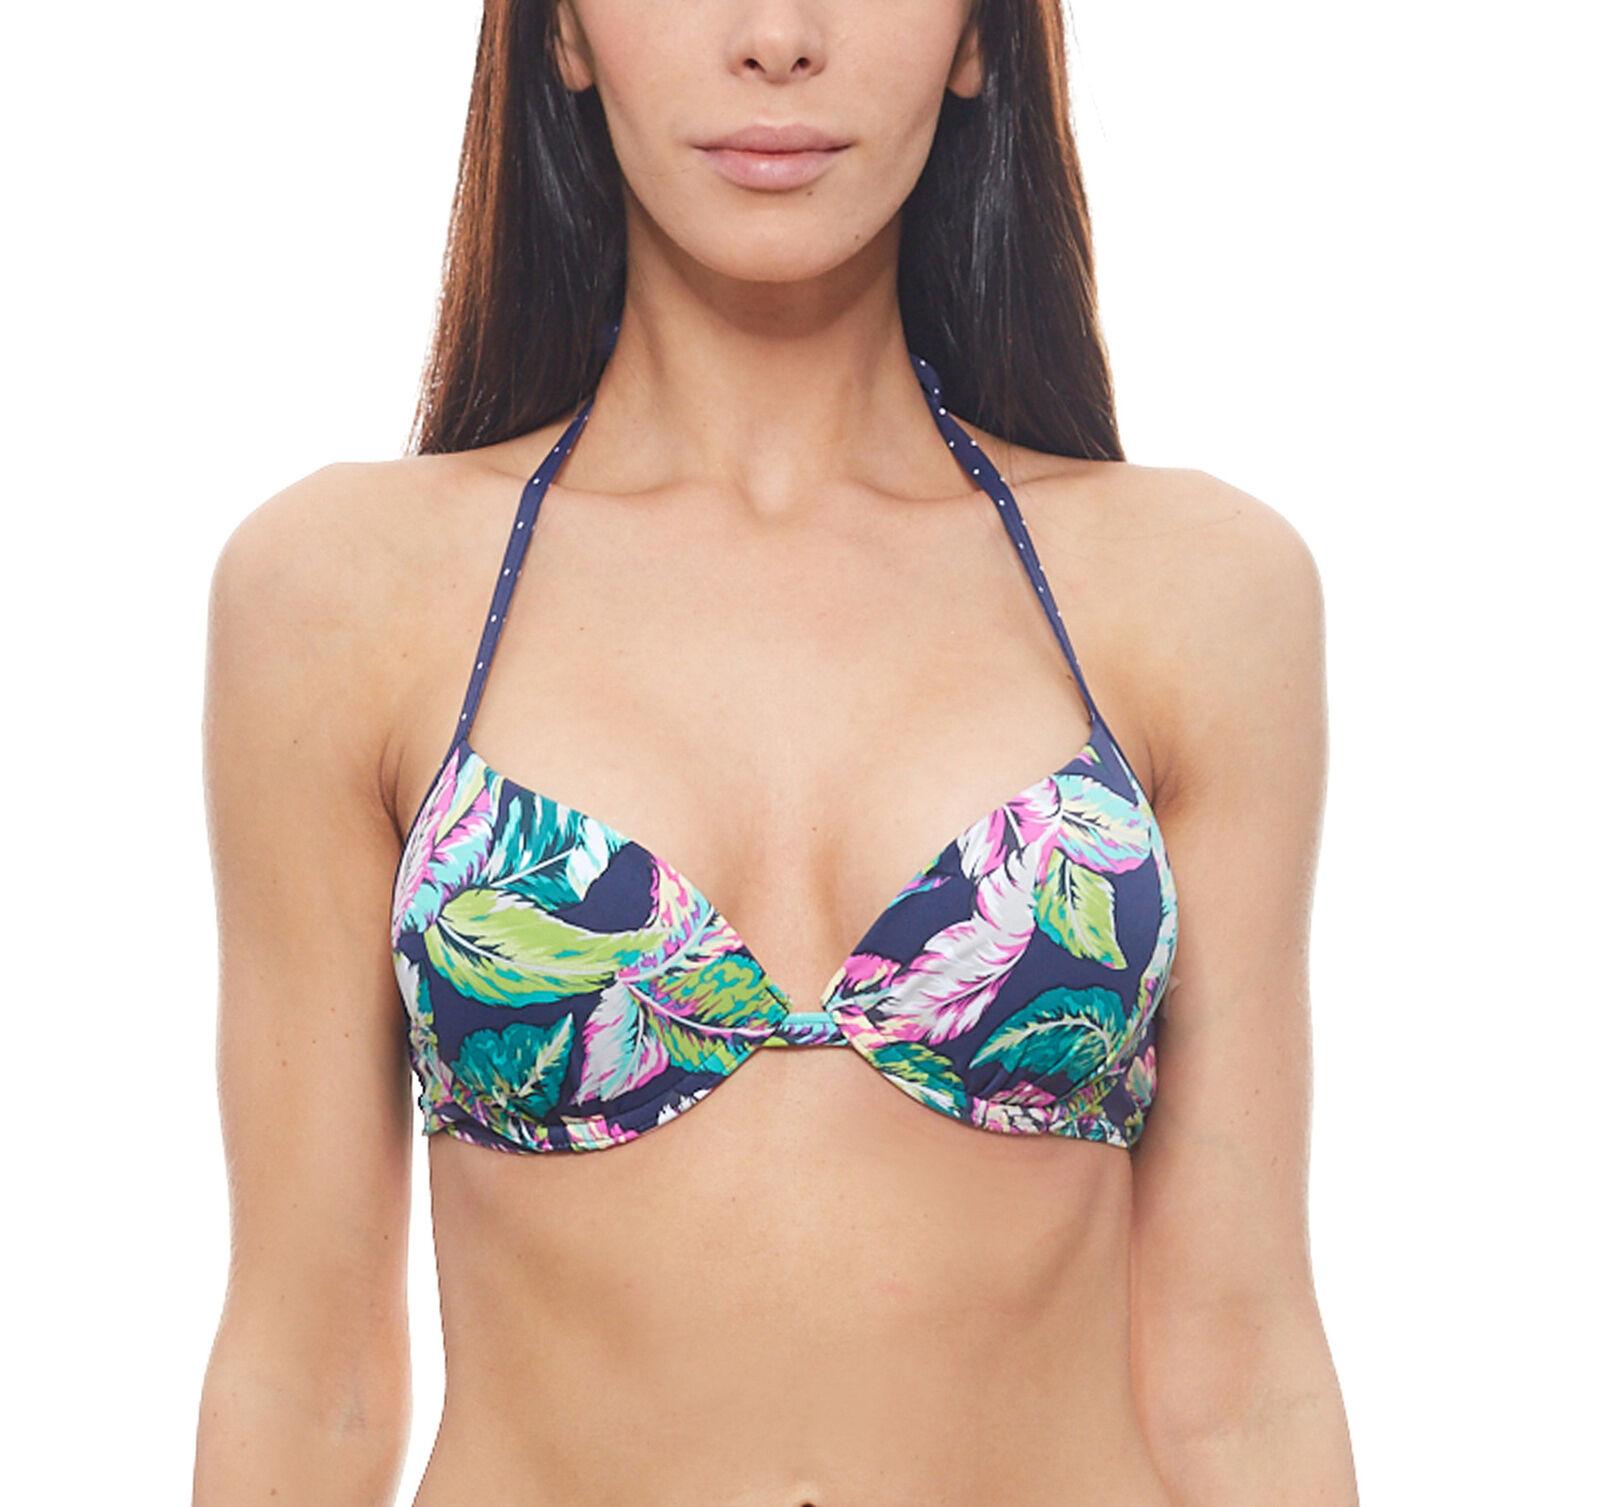 sunseeker Bikini-Oberteil wattiert Damen Sommer-Push-Up-Bikini C-Cup Top Bunt